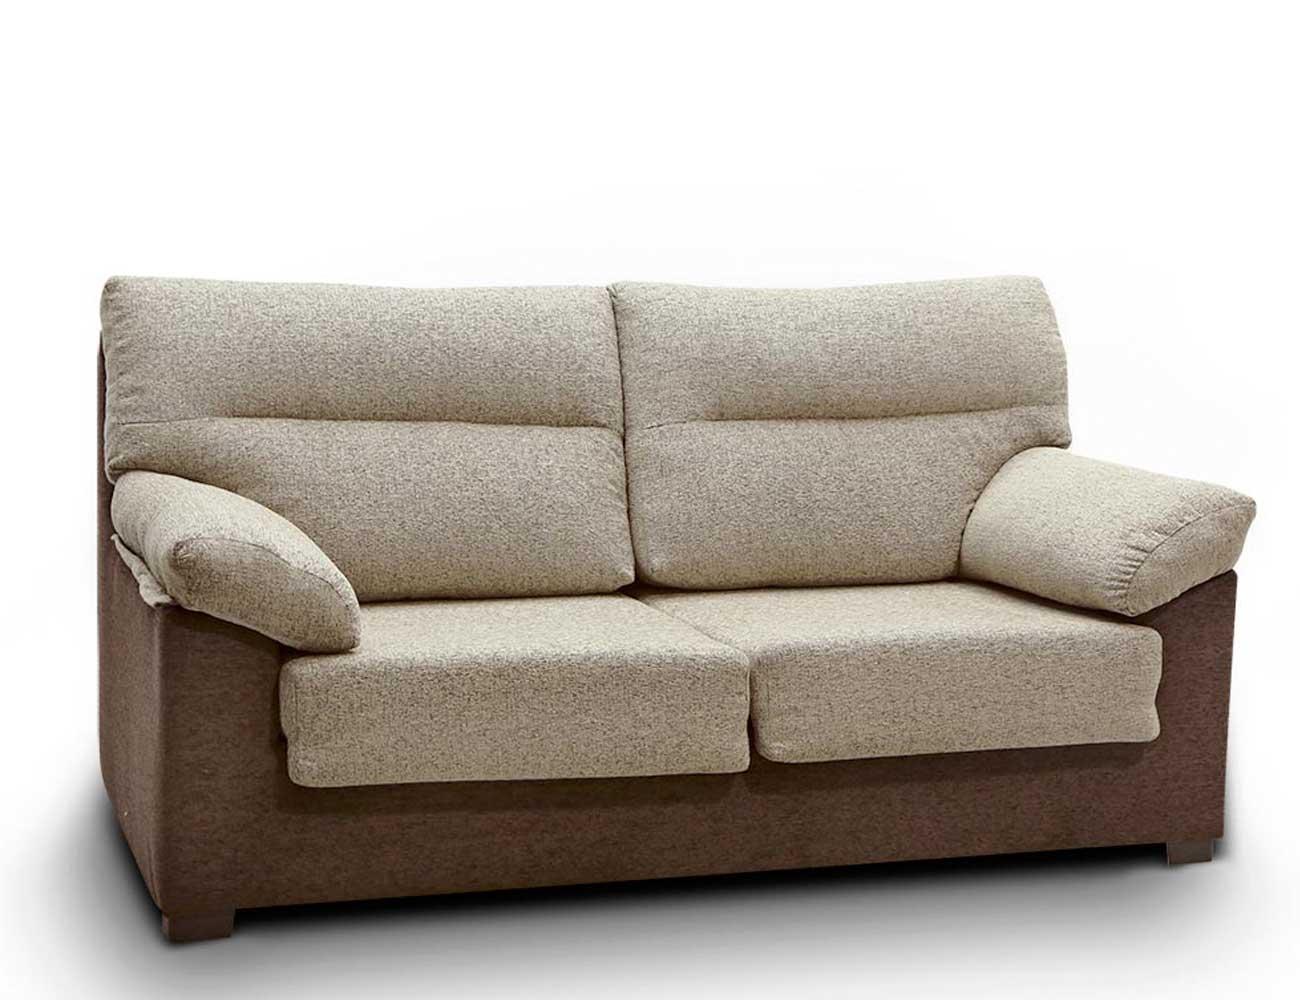 Sofa 3 plazas barato8